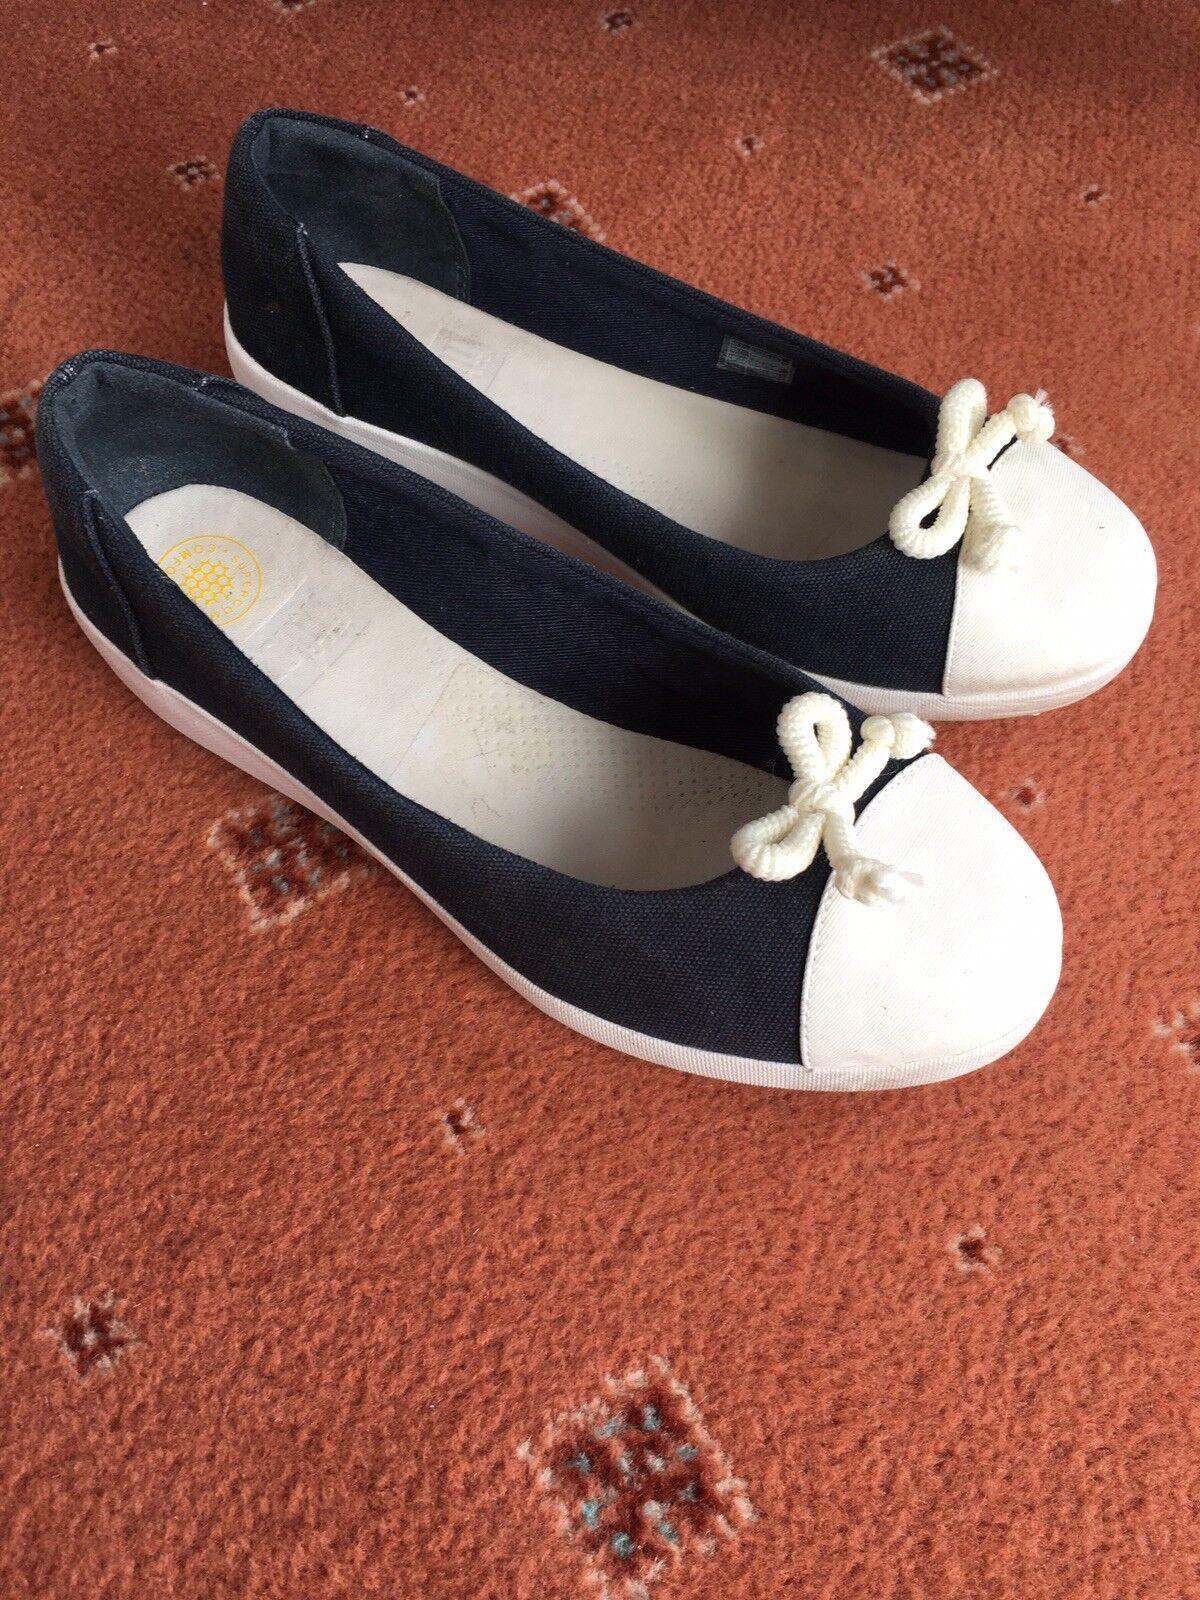 Women shoes supercomff , fittlop